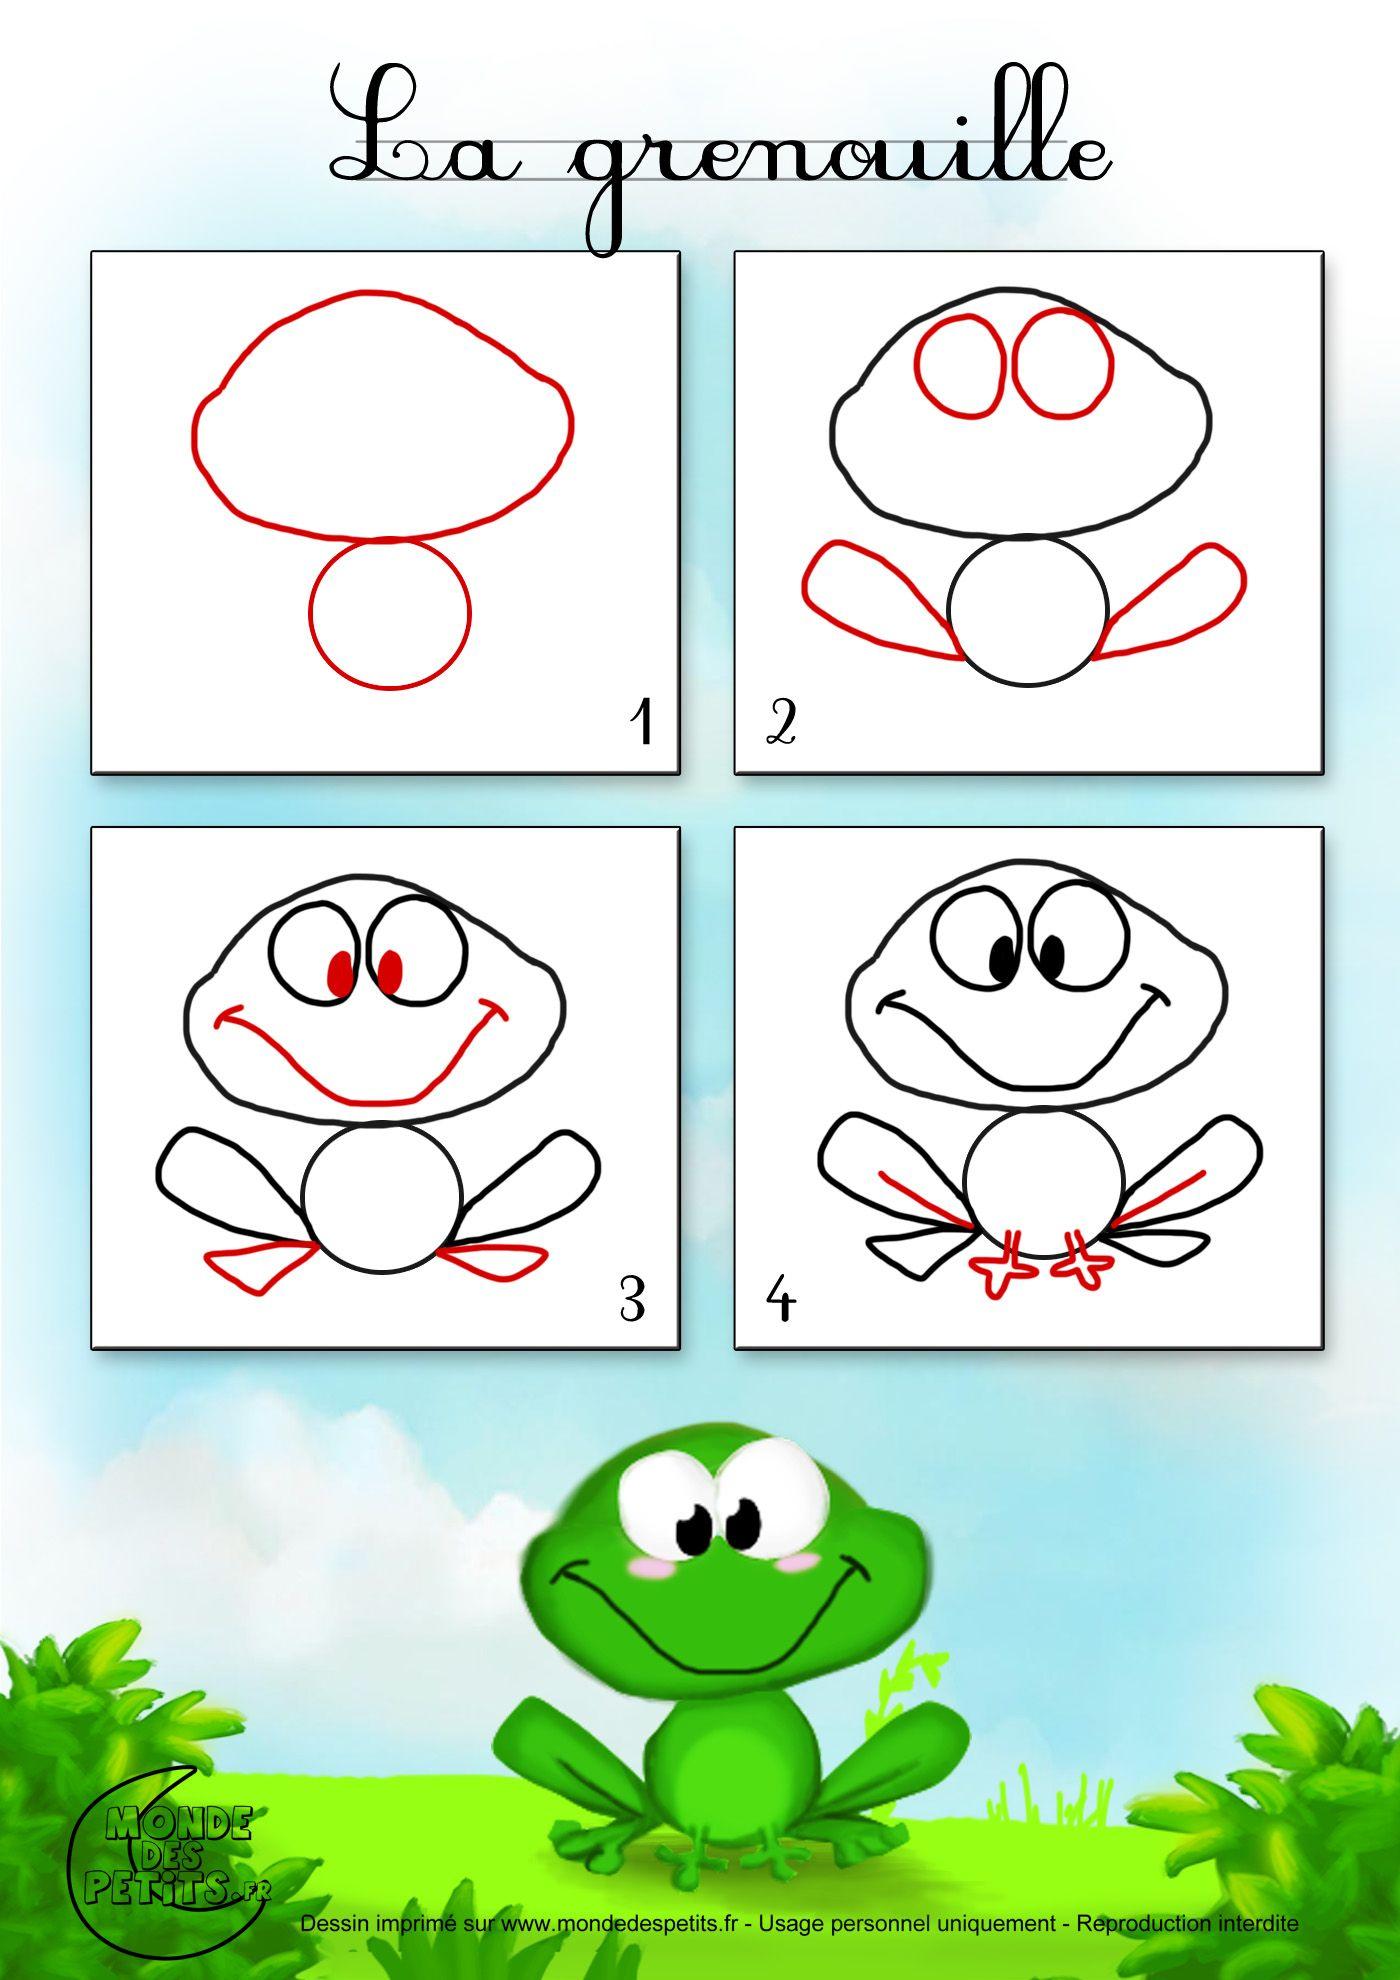 Apprendre dessiner animaux 1400 1980 ecole maternelle pinterest comment - Comment dessiner des animaux ...